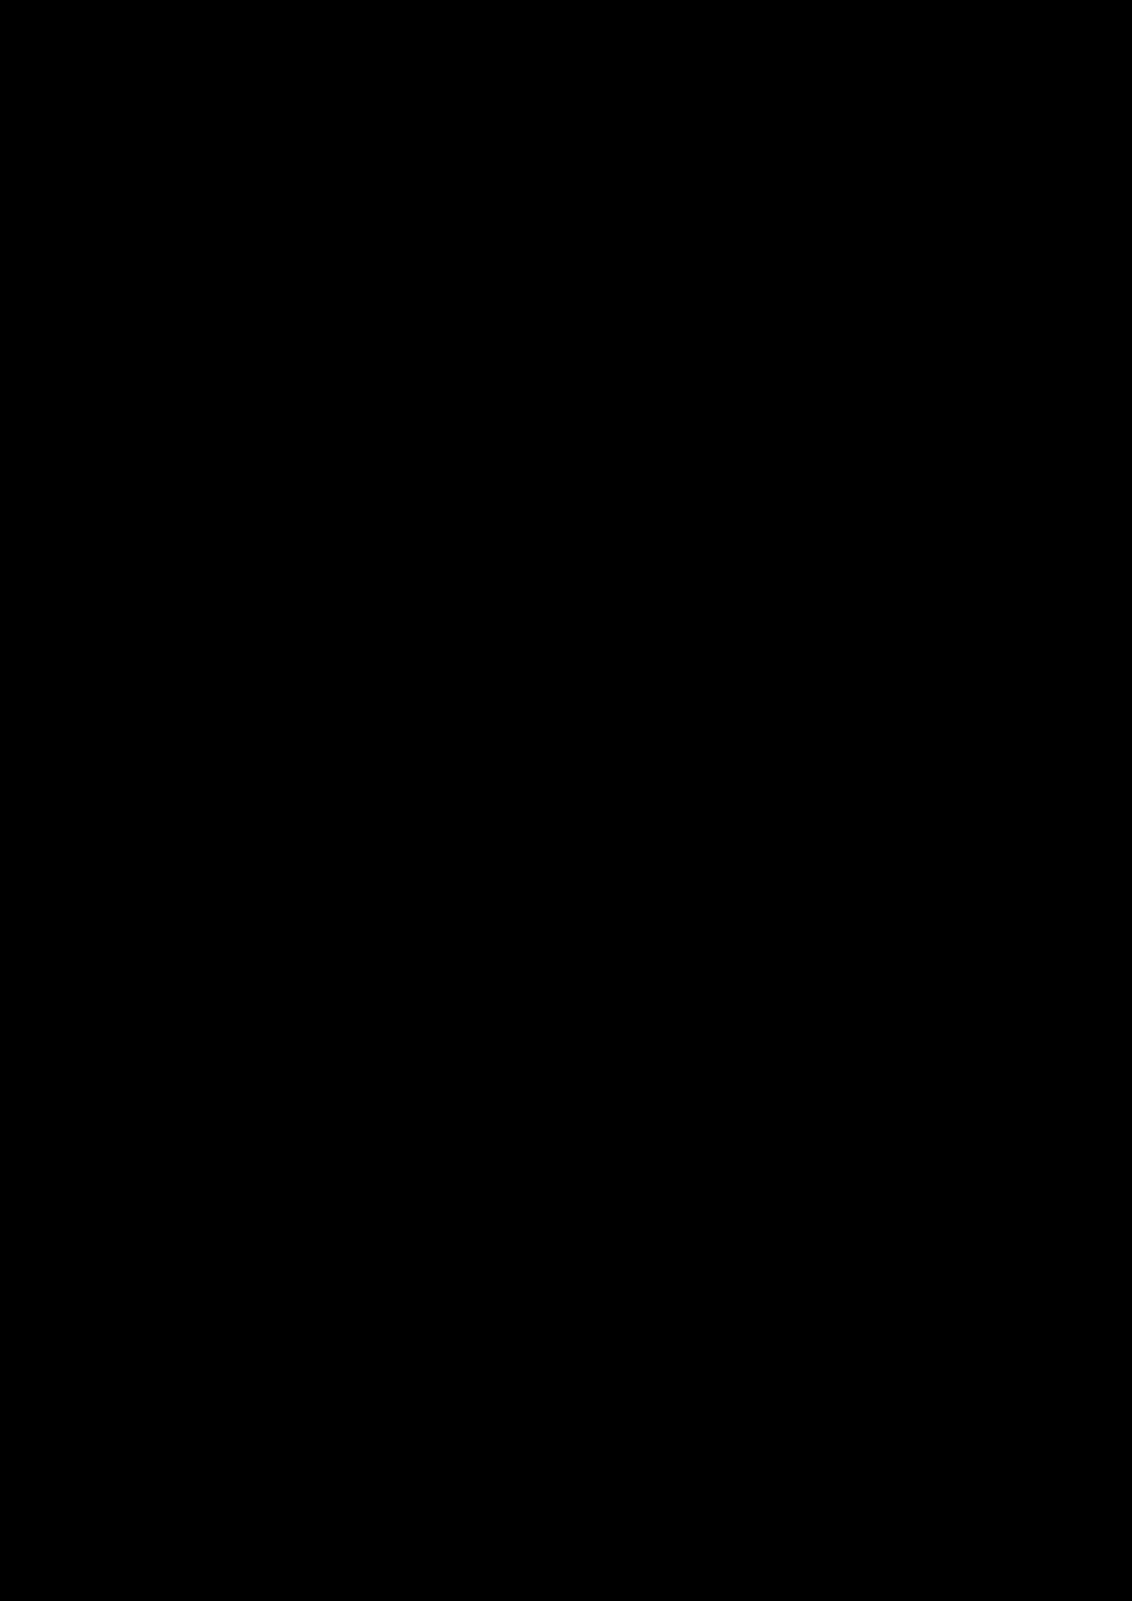 Okean Pustotyi slide, Image 31